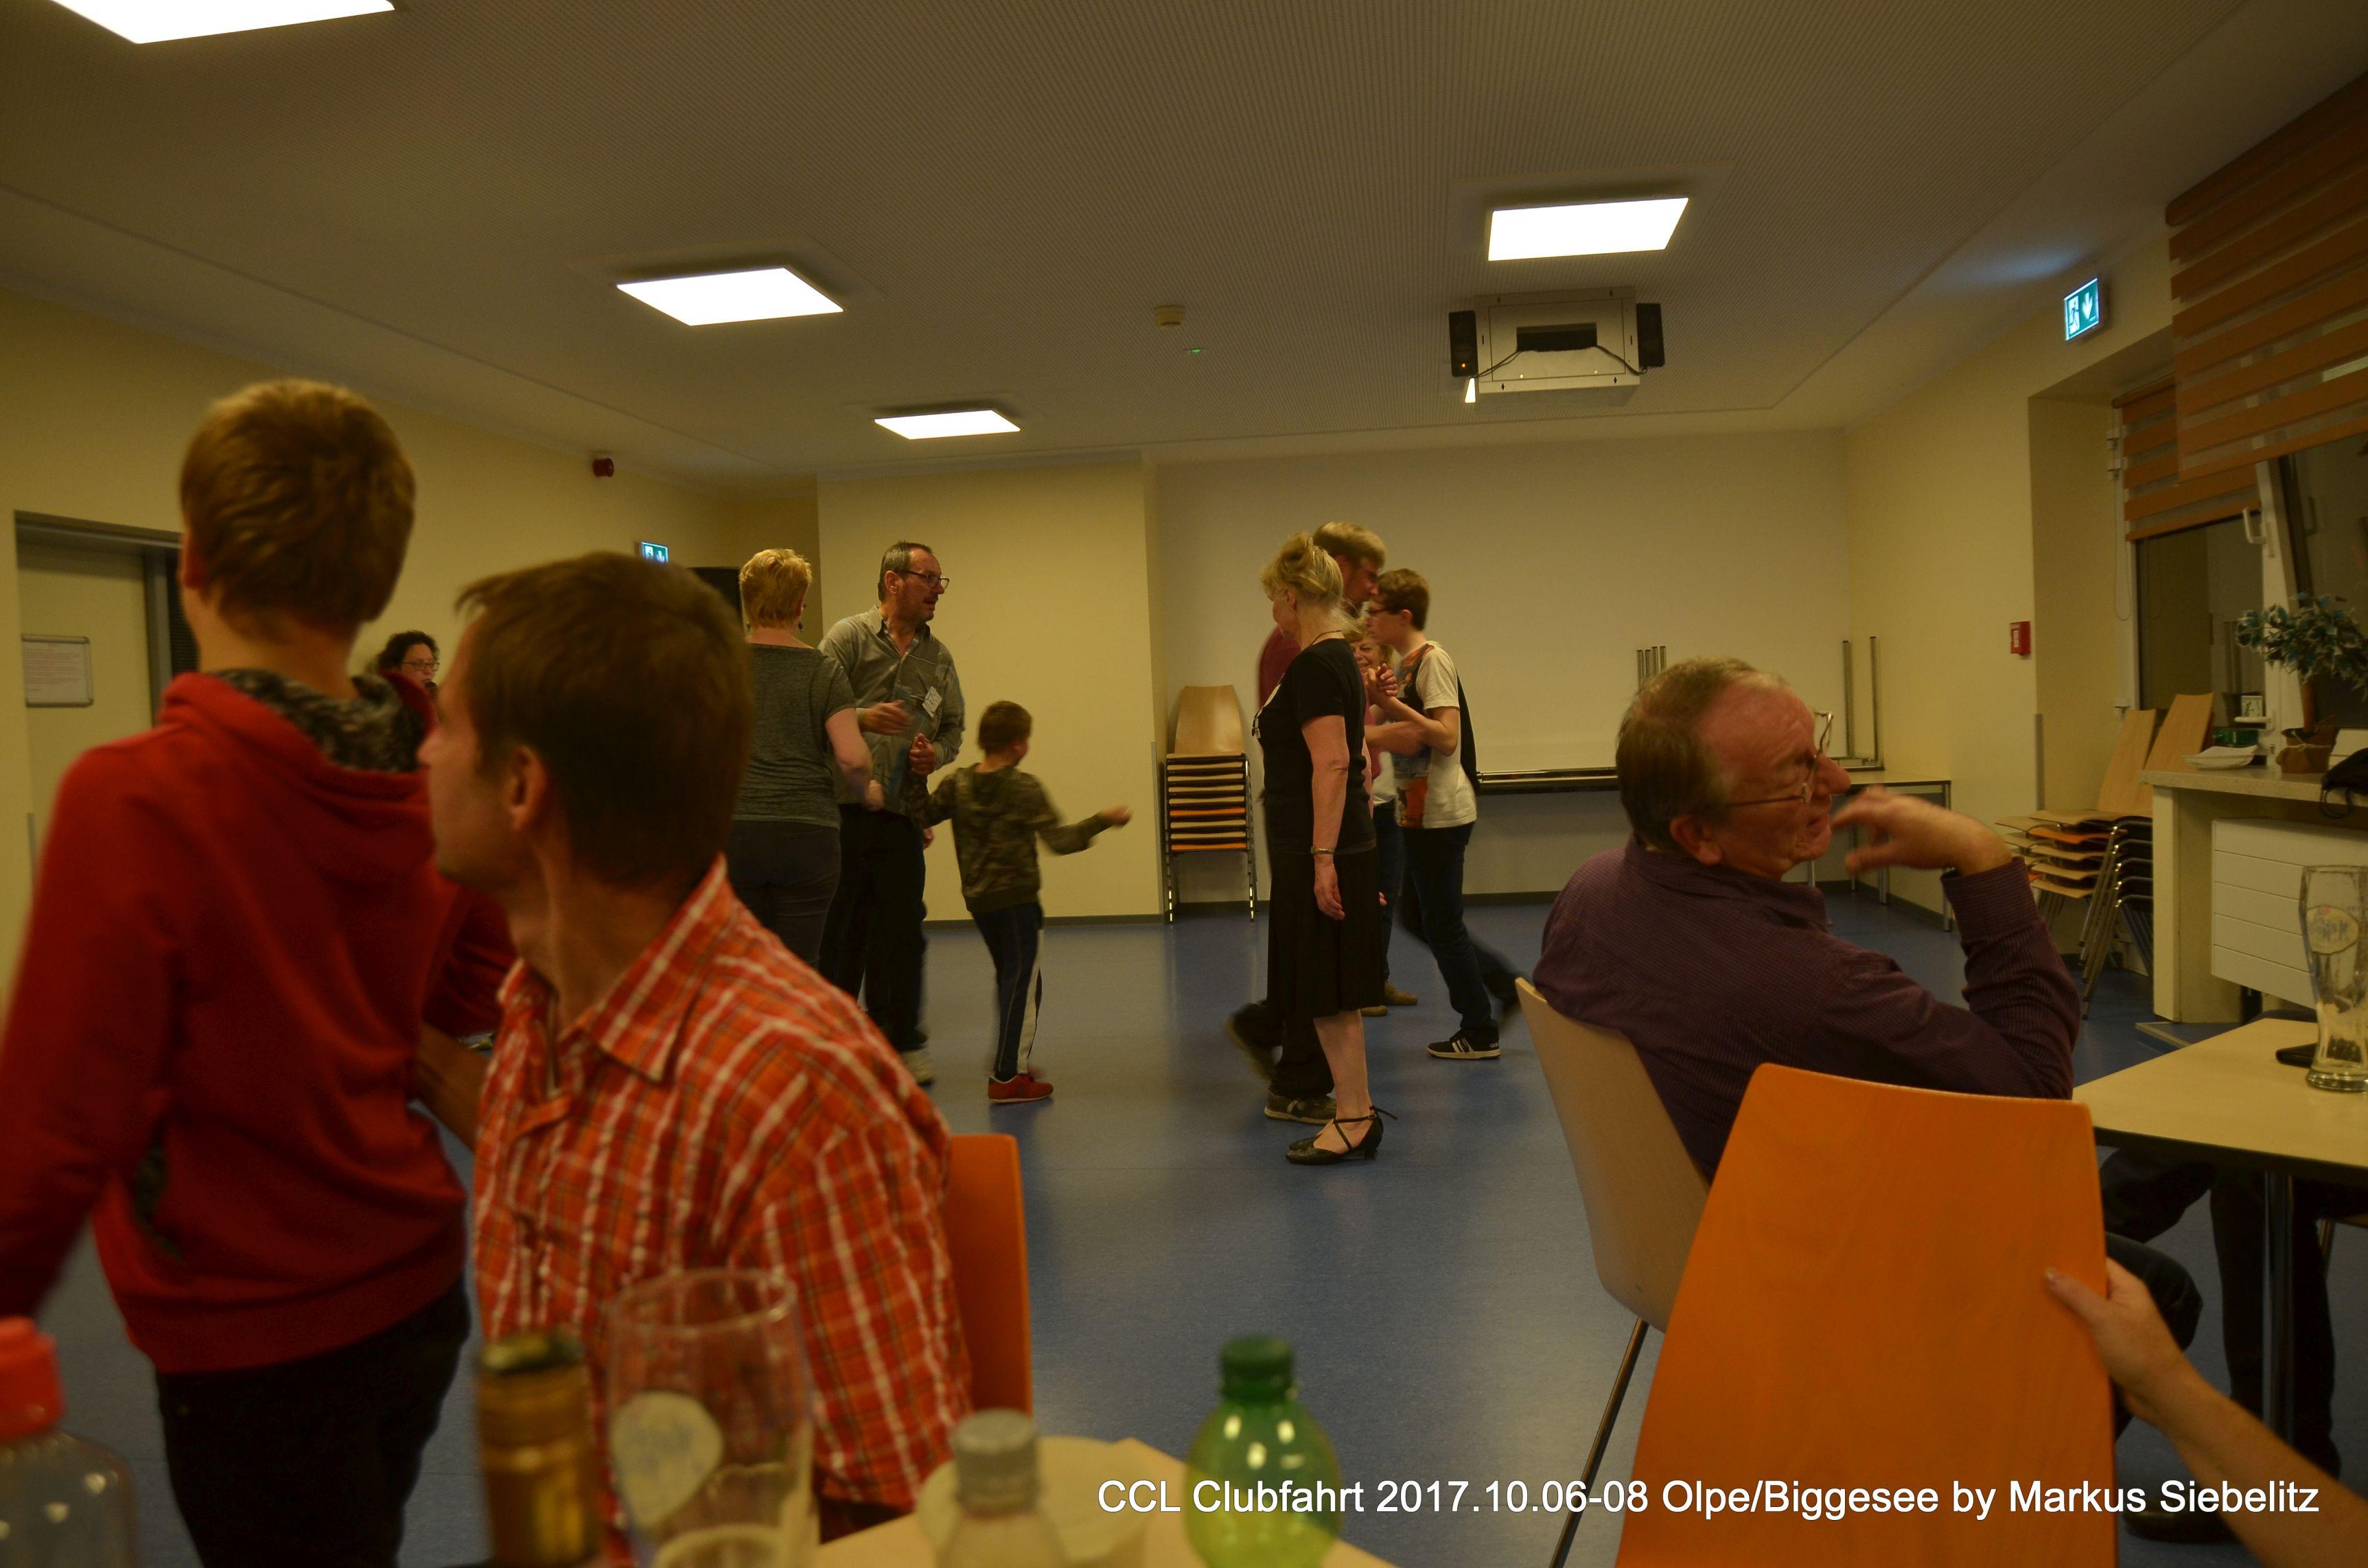 CCL Clubfahrt 2017.10.06-08 Biggesee (20)